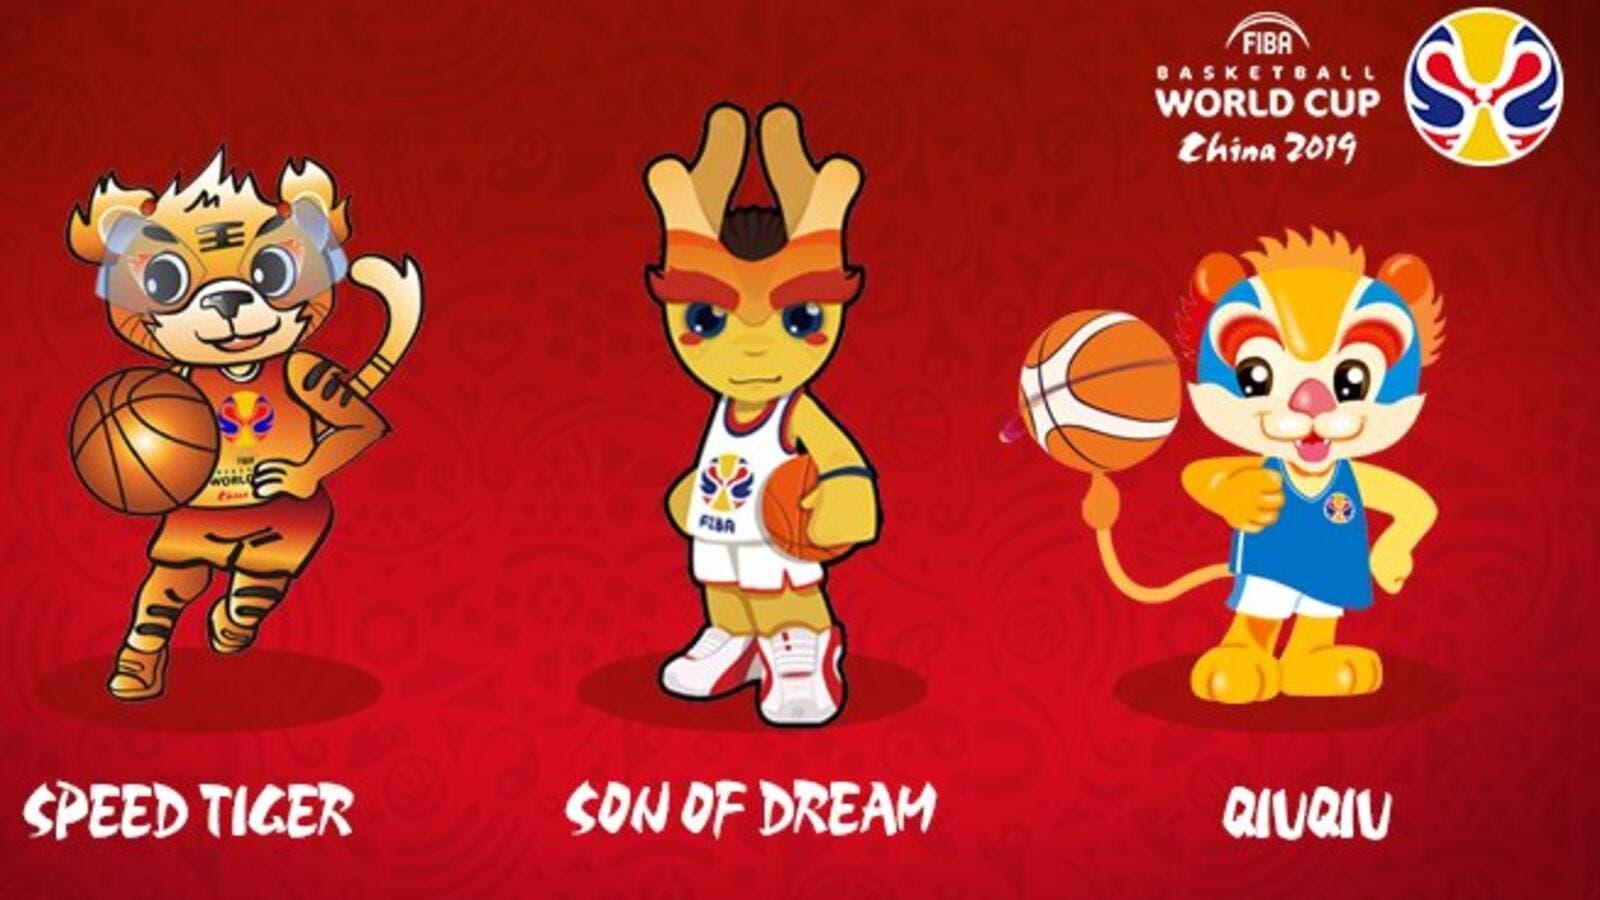 basketball world cup - photo #11